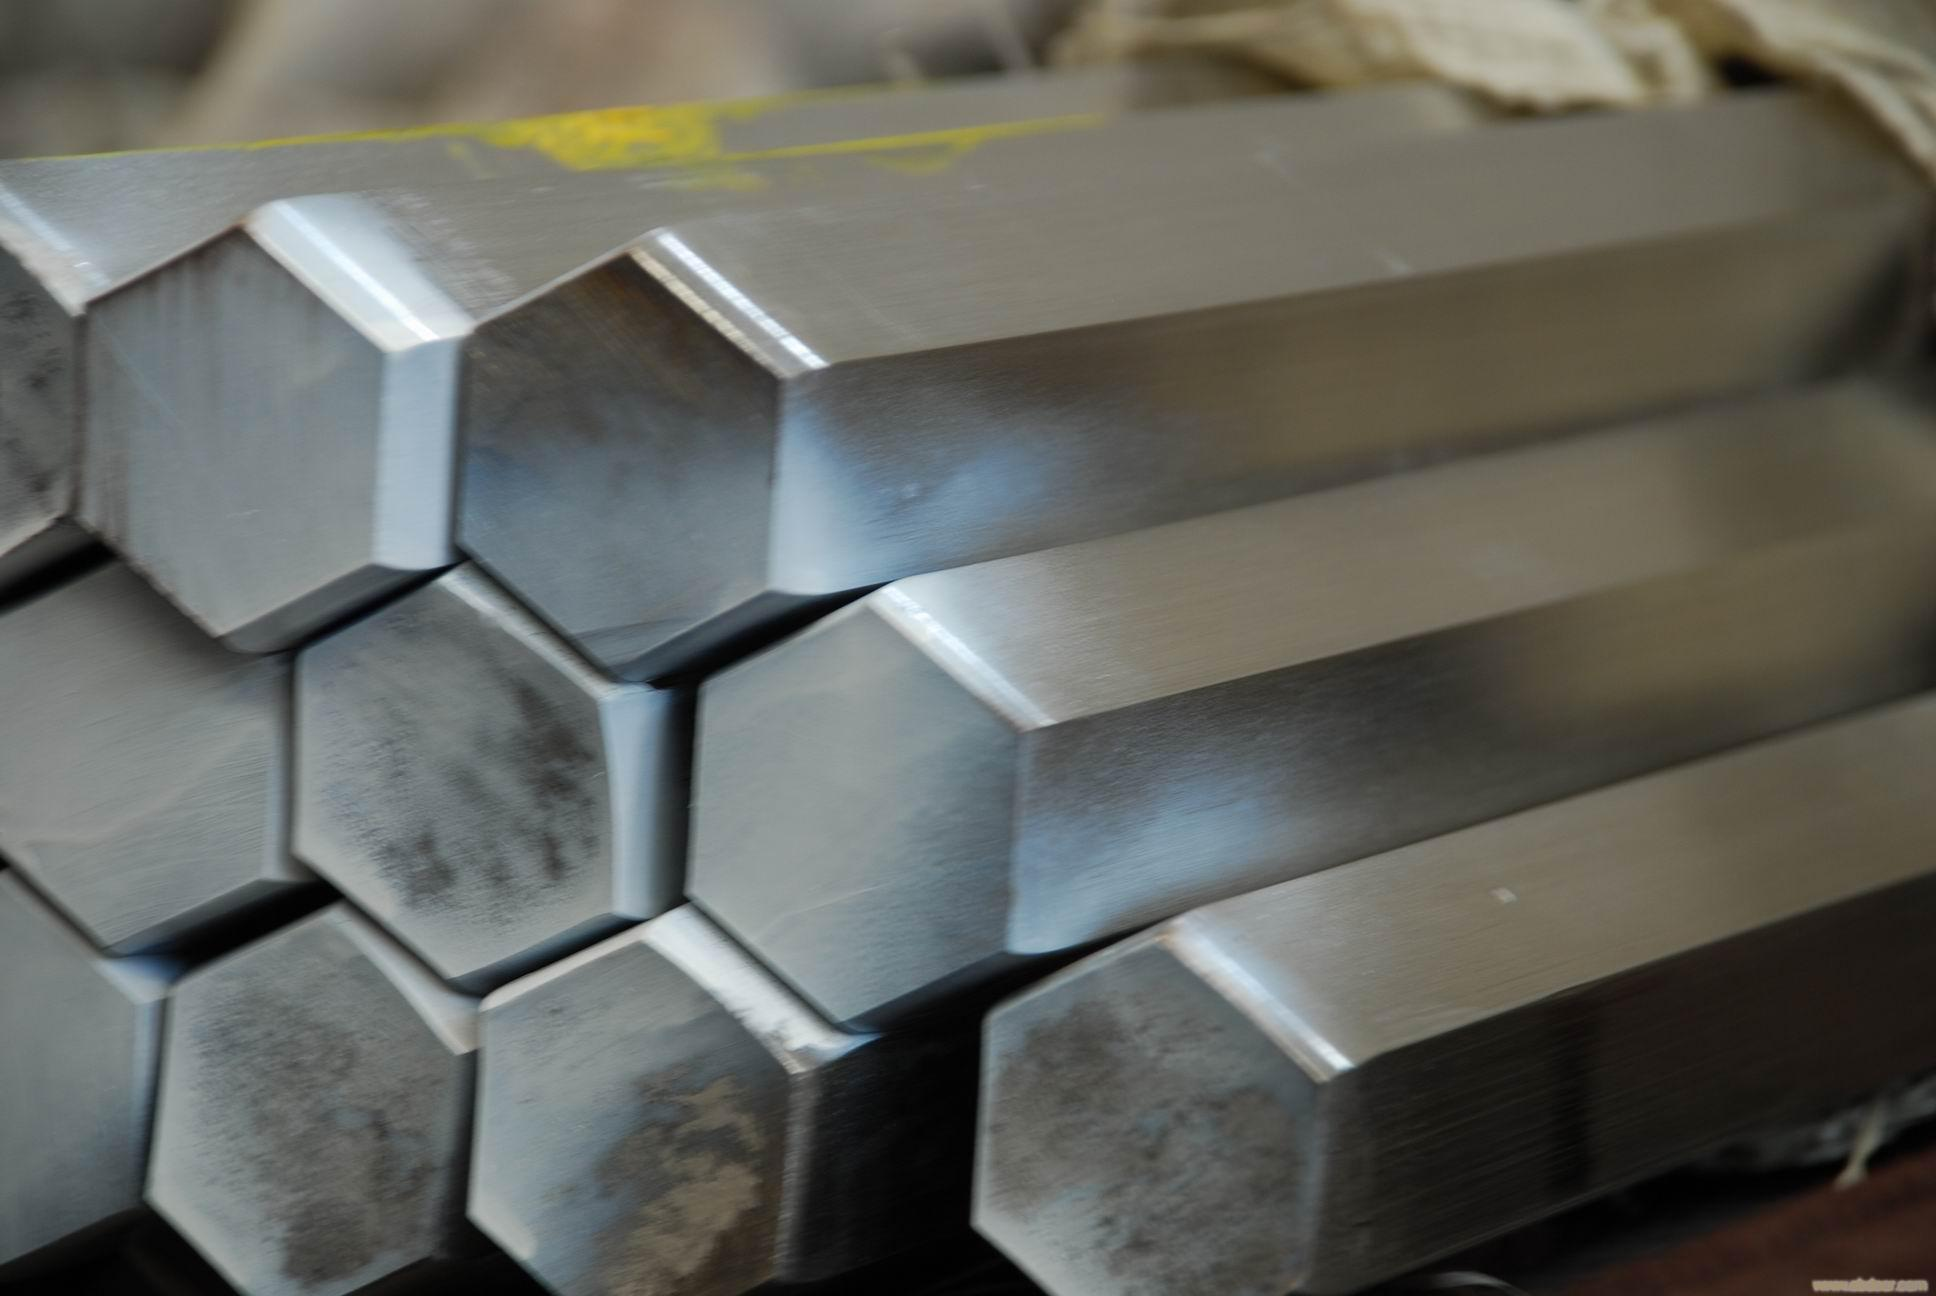 Stainless Steel Hexagon Bar Stainless Steel Hex Bar